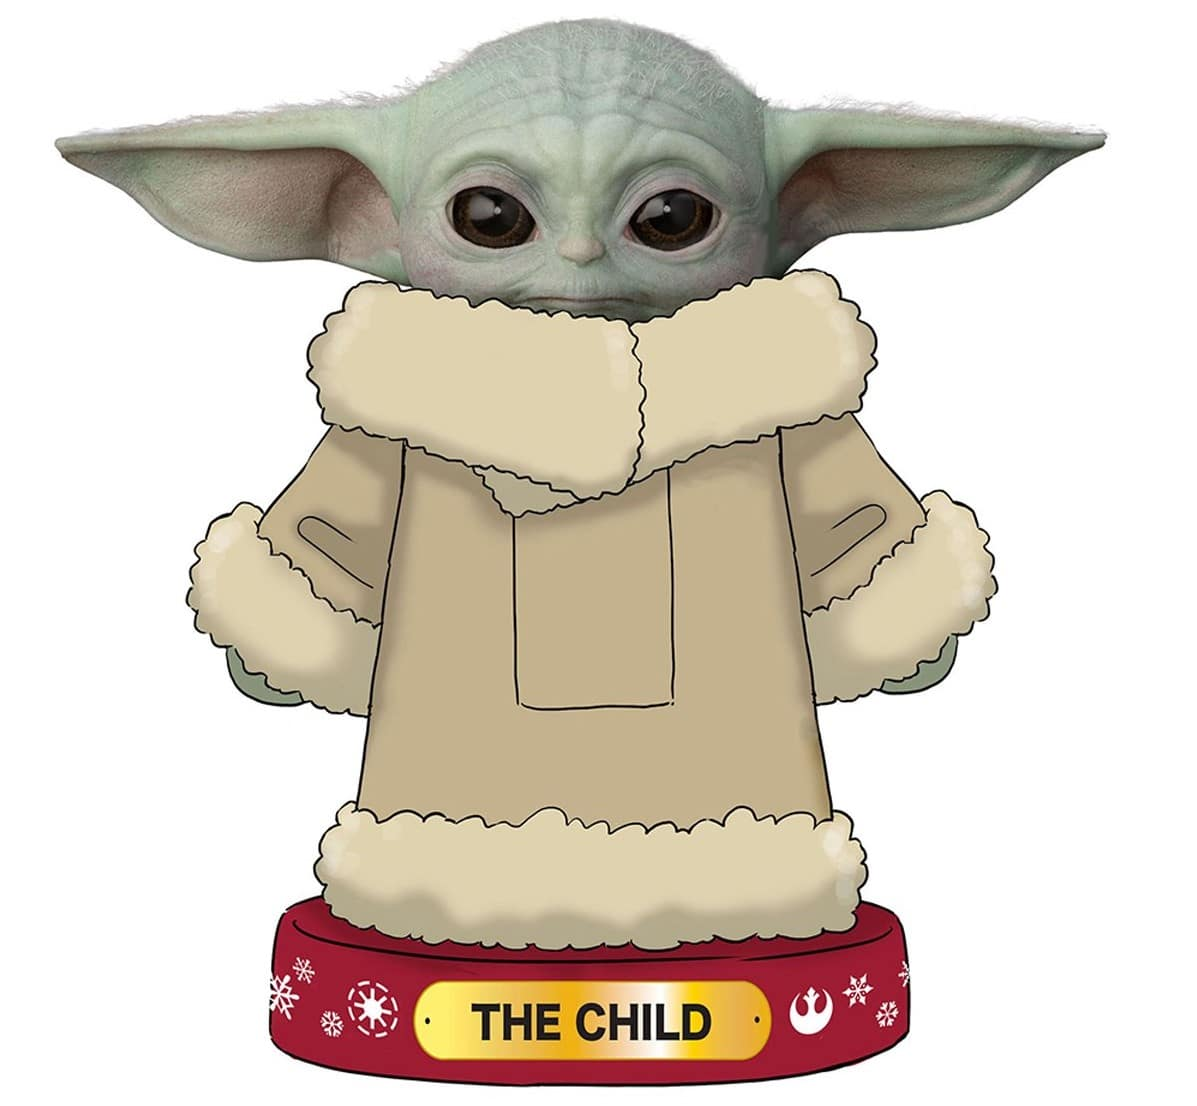 Baby Yoda Christmas stockings, nutcracker and snow globe make us feel like it's Christmas in June 16